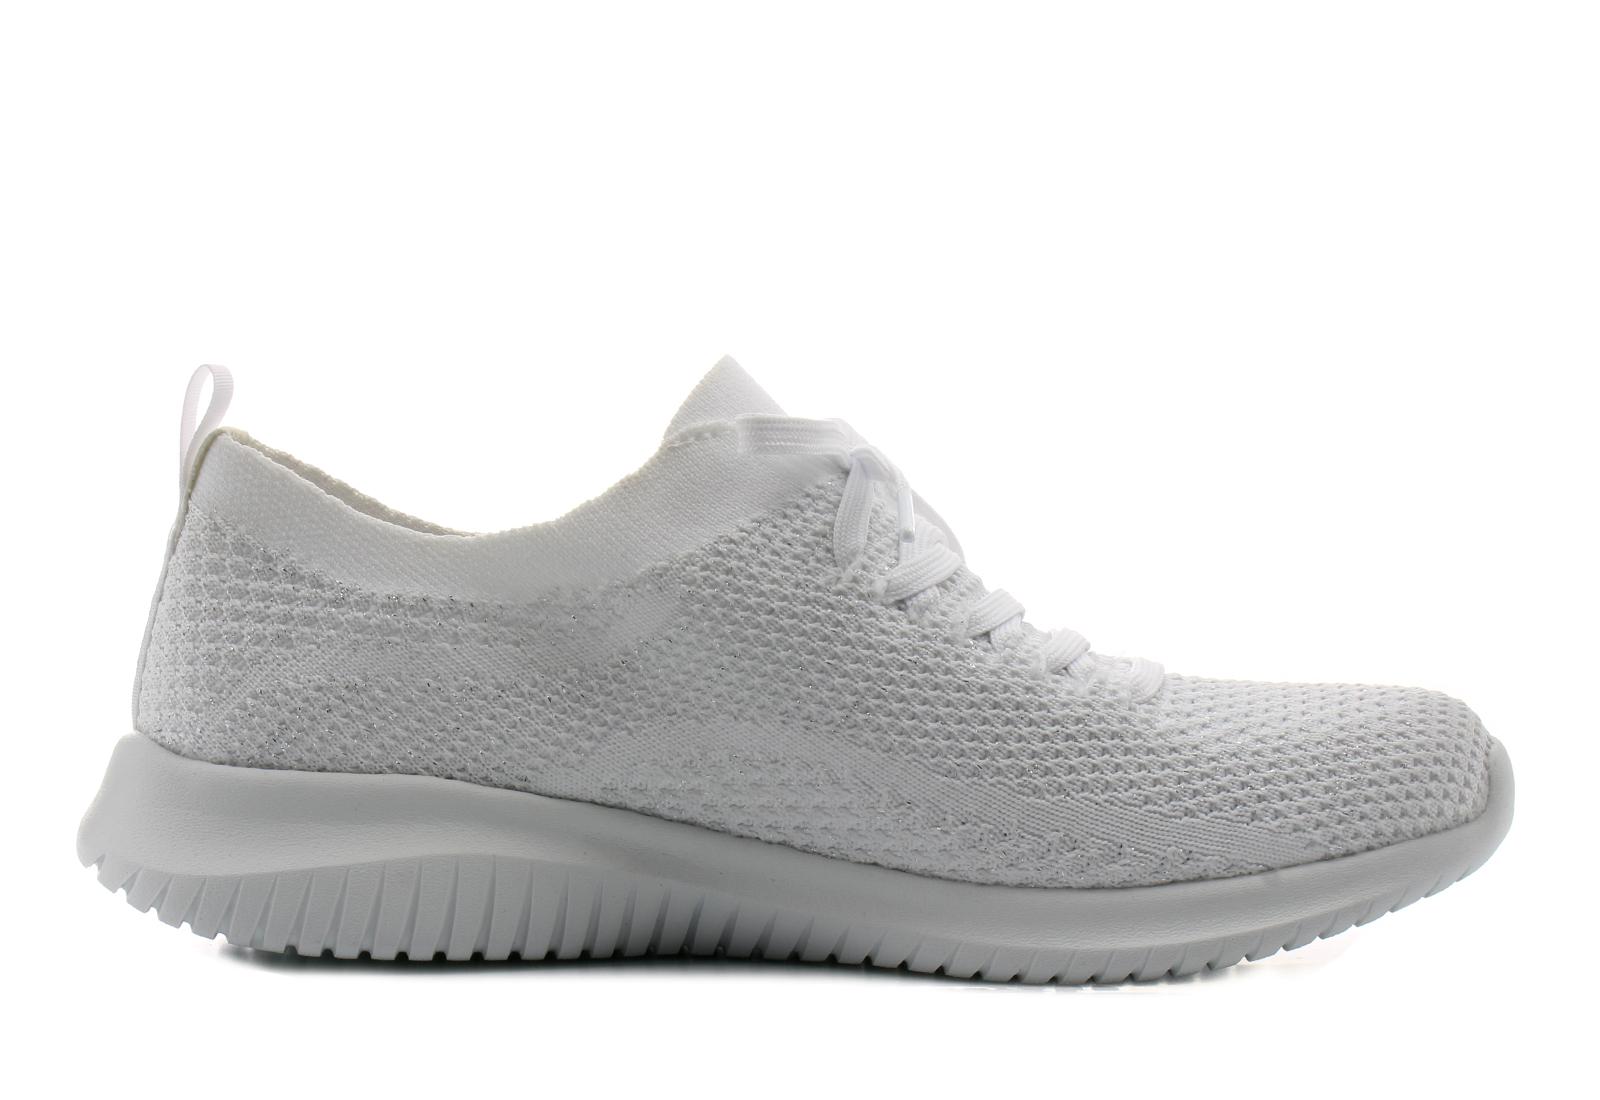 Skechers Shoes Ultra Flex Salutations 12843 Wsl